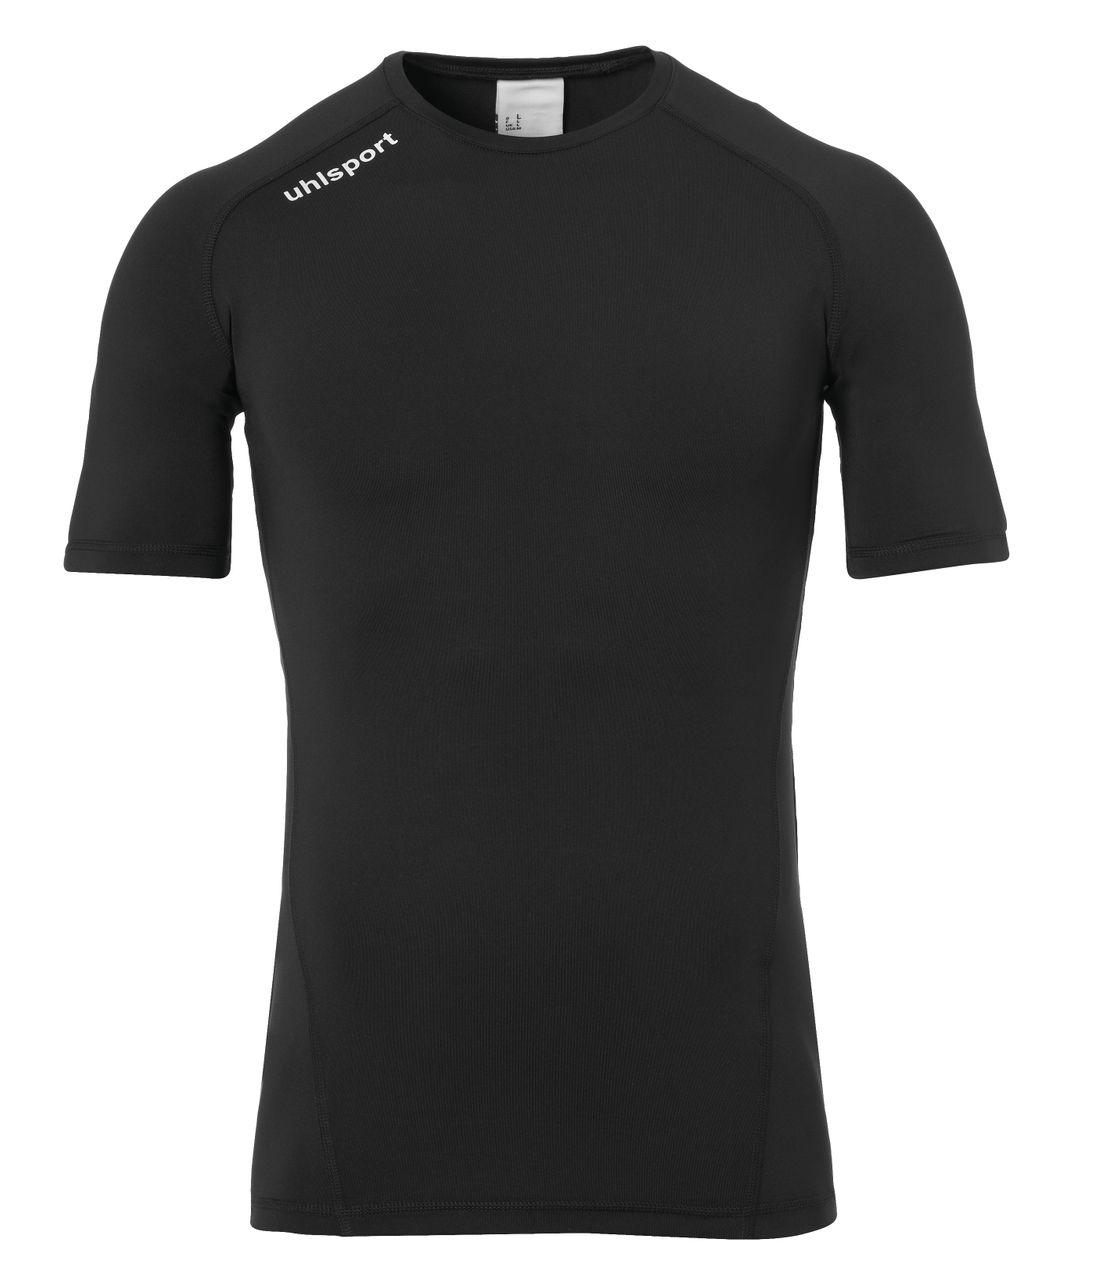 Uhlsport DISTINCTION PRO BASELAYER round neck compression shirt short sleeve